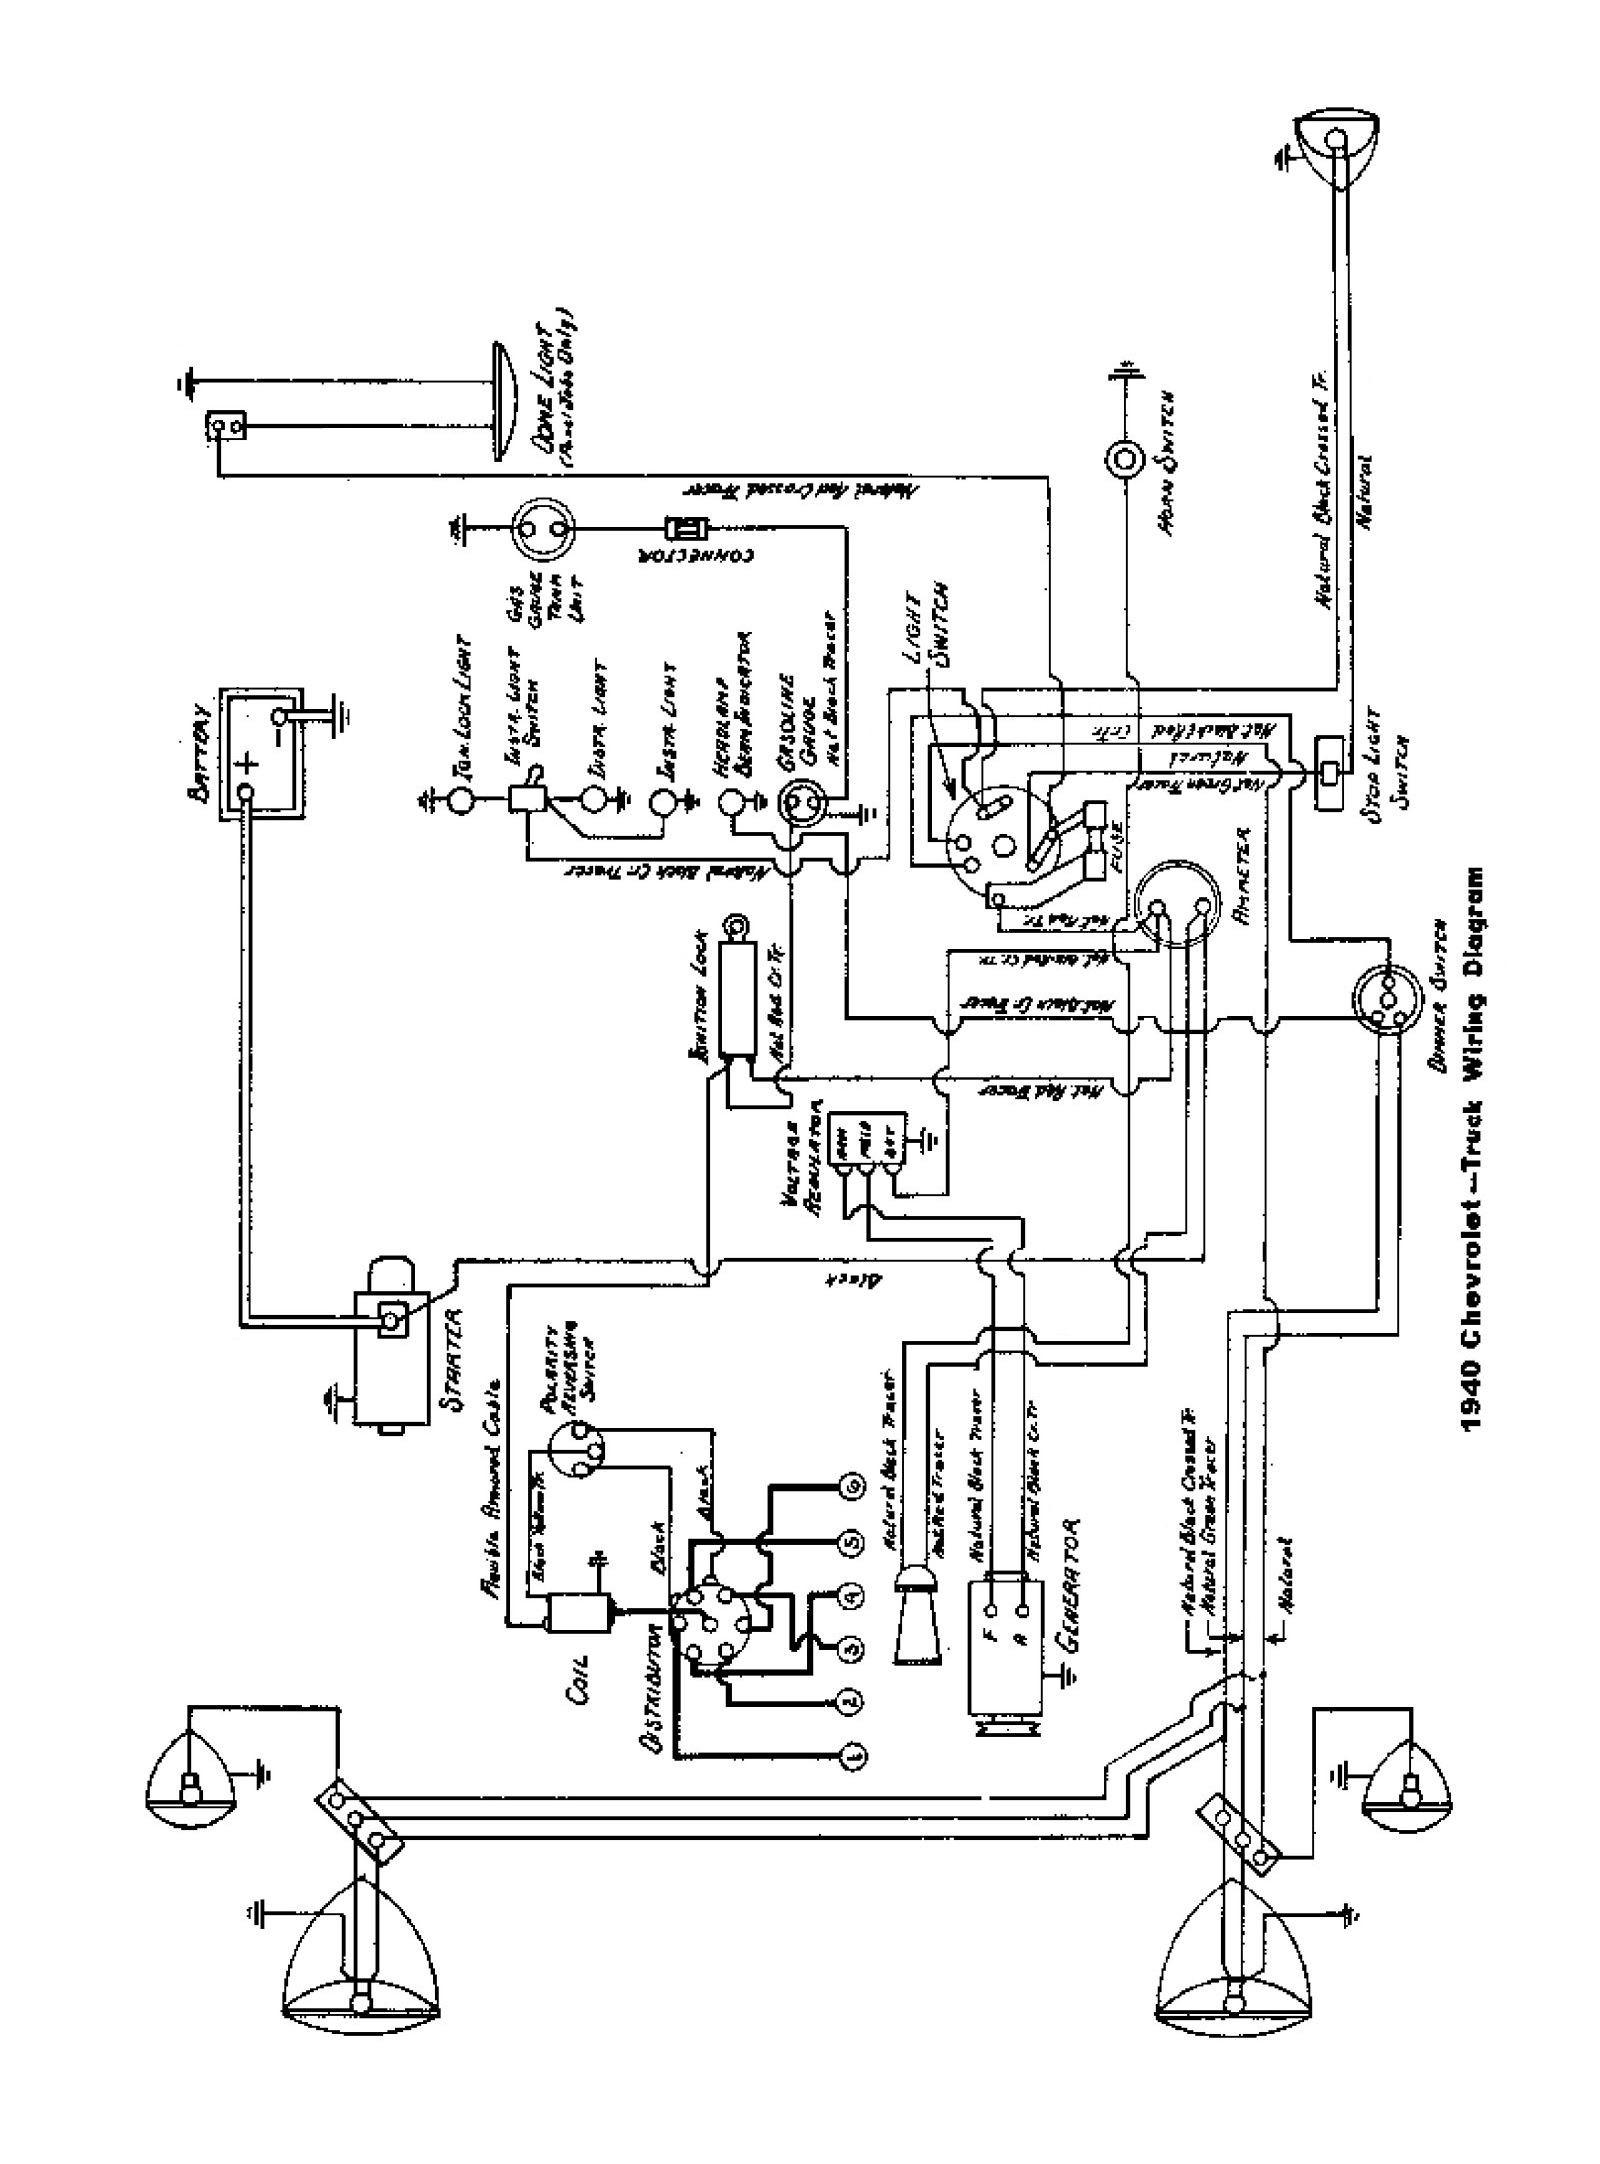 1953 Chevy Truck Wiring Diagram 1960 Chevy Wiring Diagram 1960 Chevy Pickup Wiring Diagram Wiring Of 1953 Chevy Truck Wiring Diagram